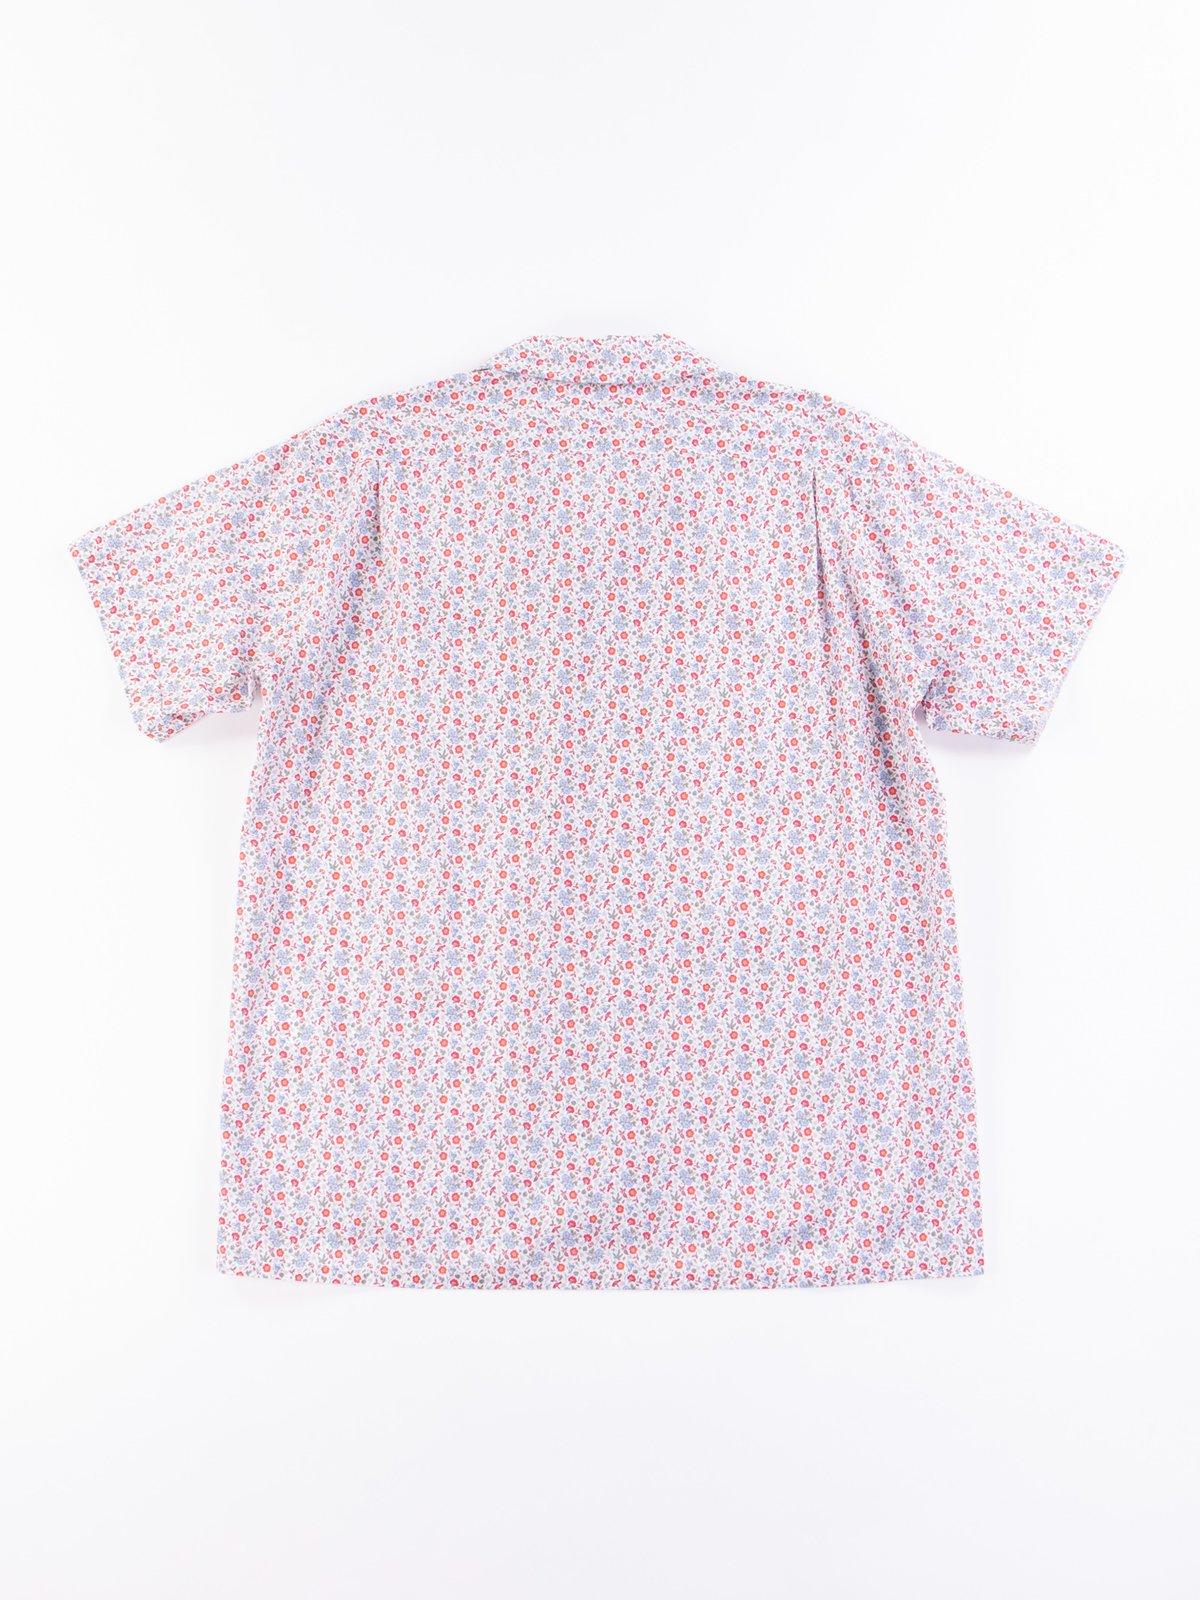 White/Blue/Orange Small Floral Camp Shirt - Image 5